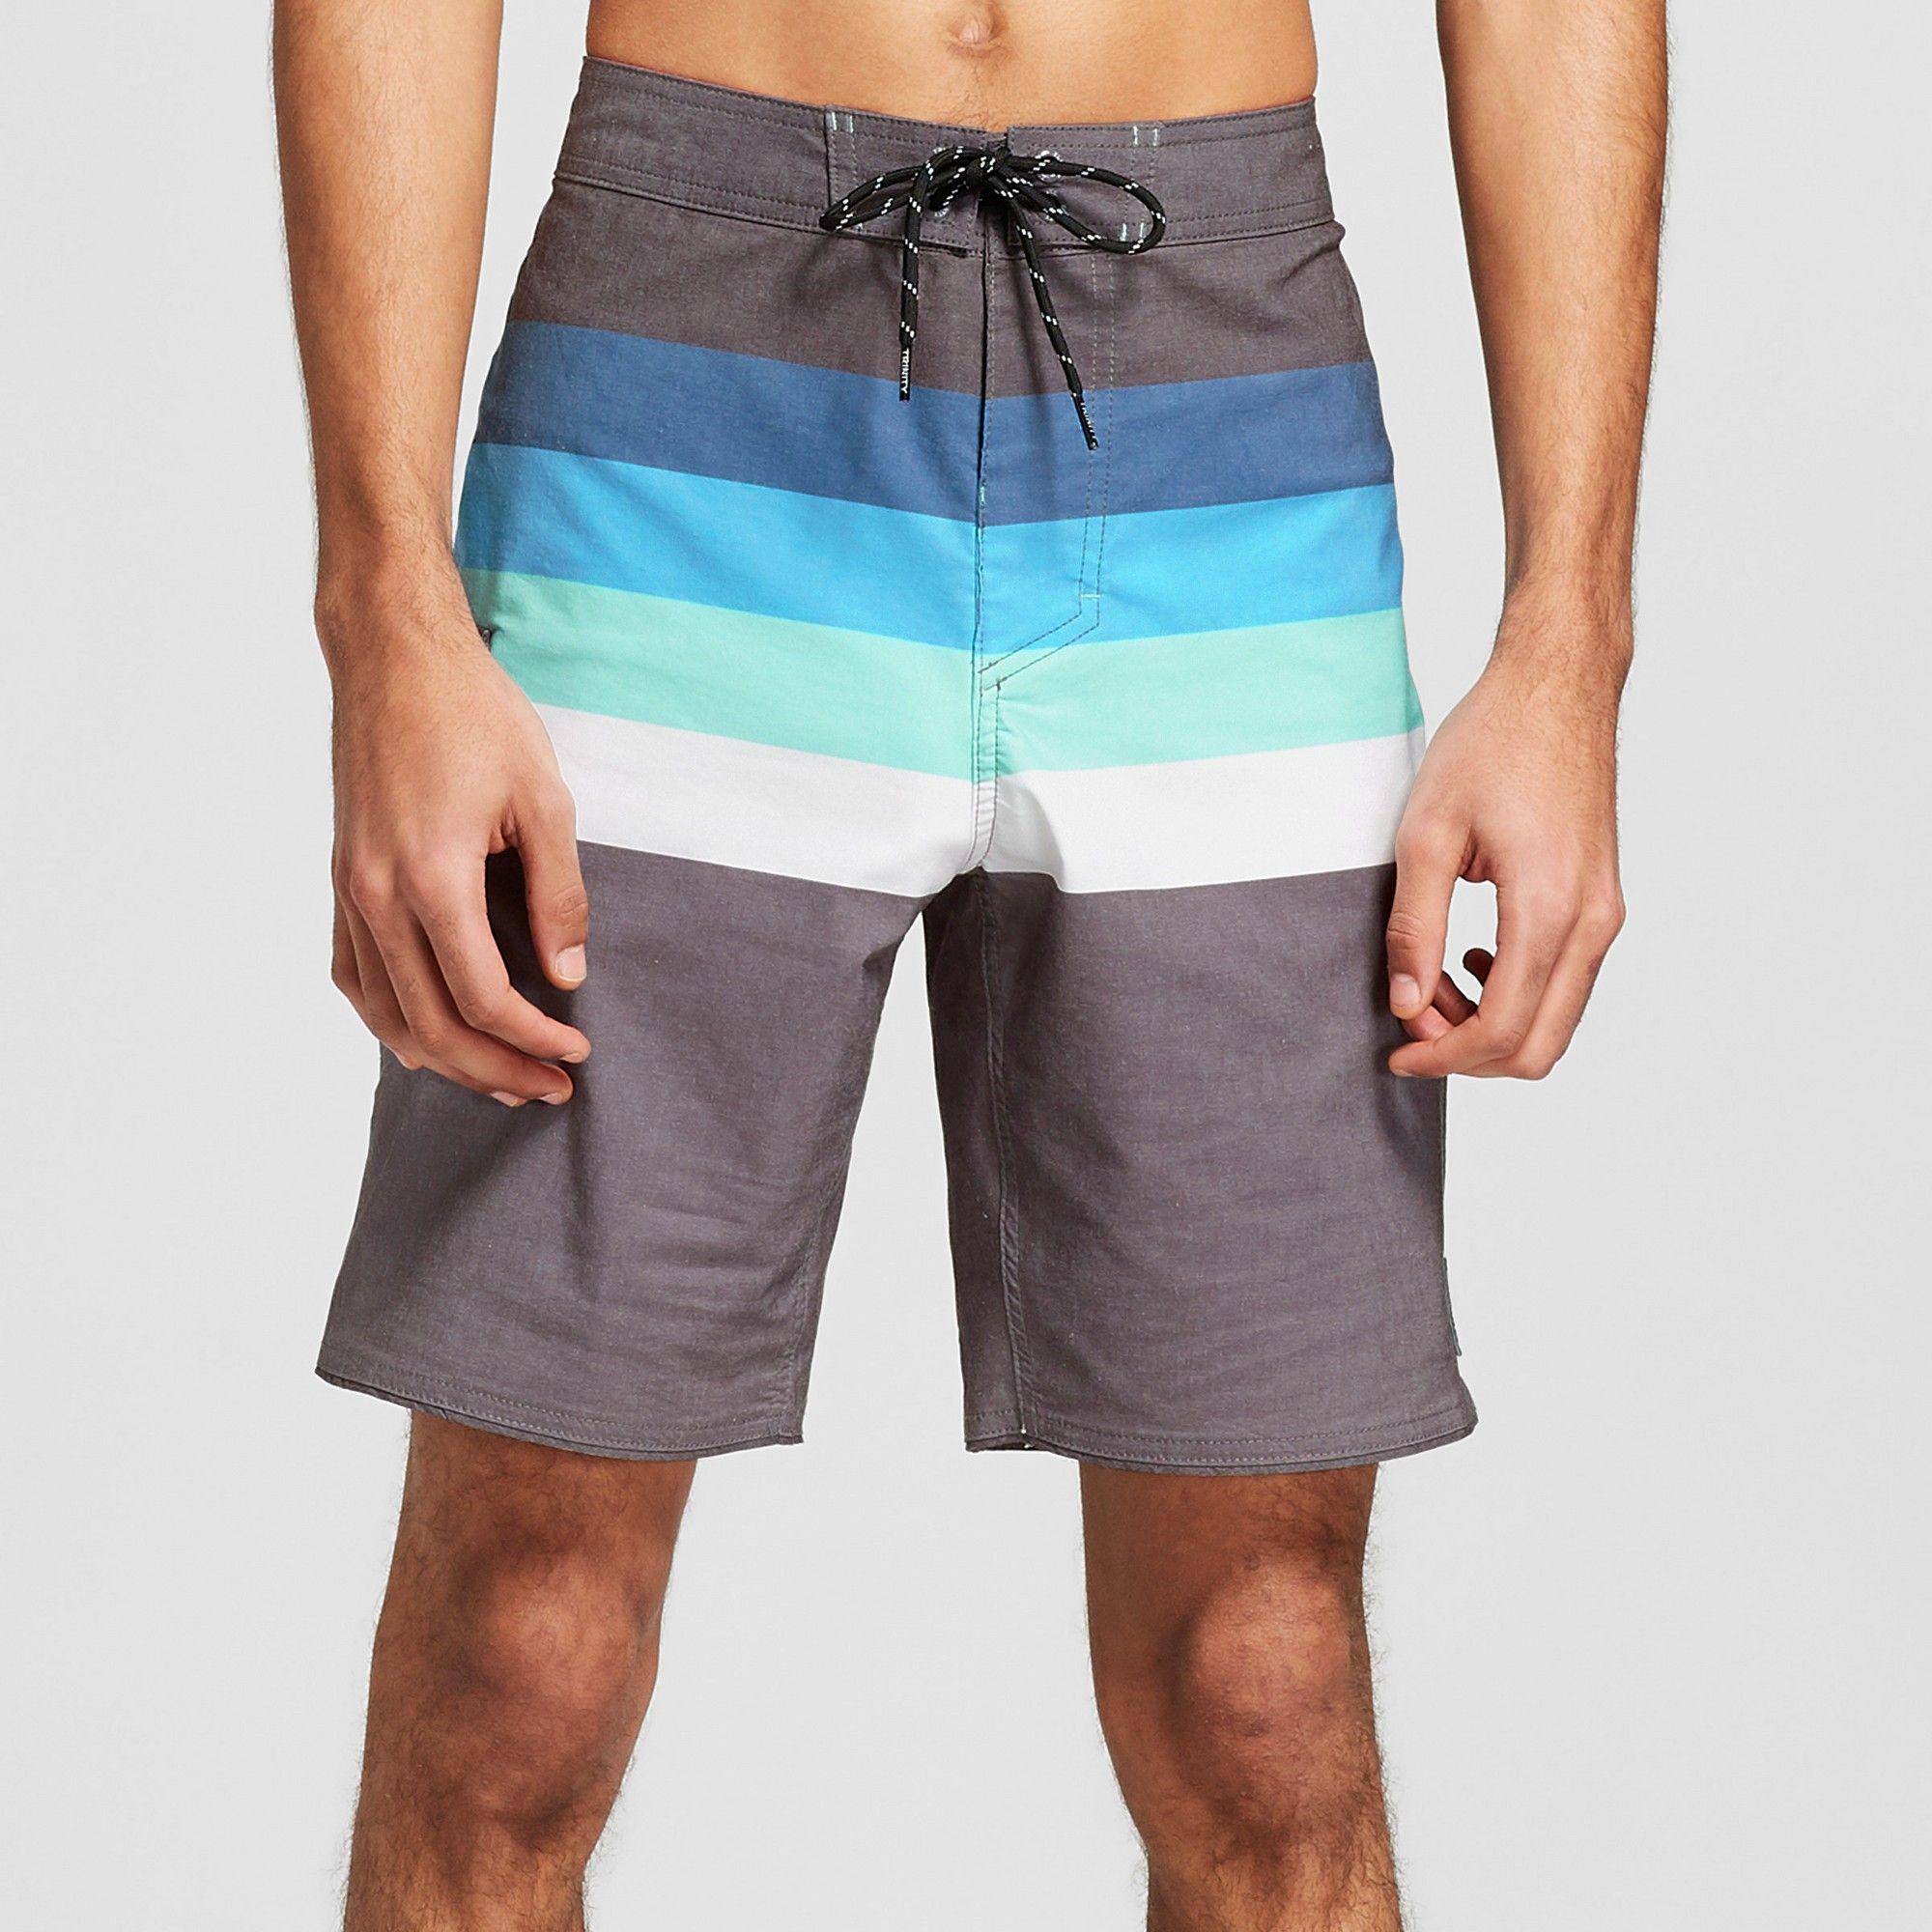 31931d702d Men's 8.5 Striped Vector Scallop Board Shorts - Trinity Black 36 ...